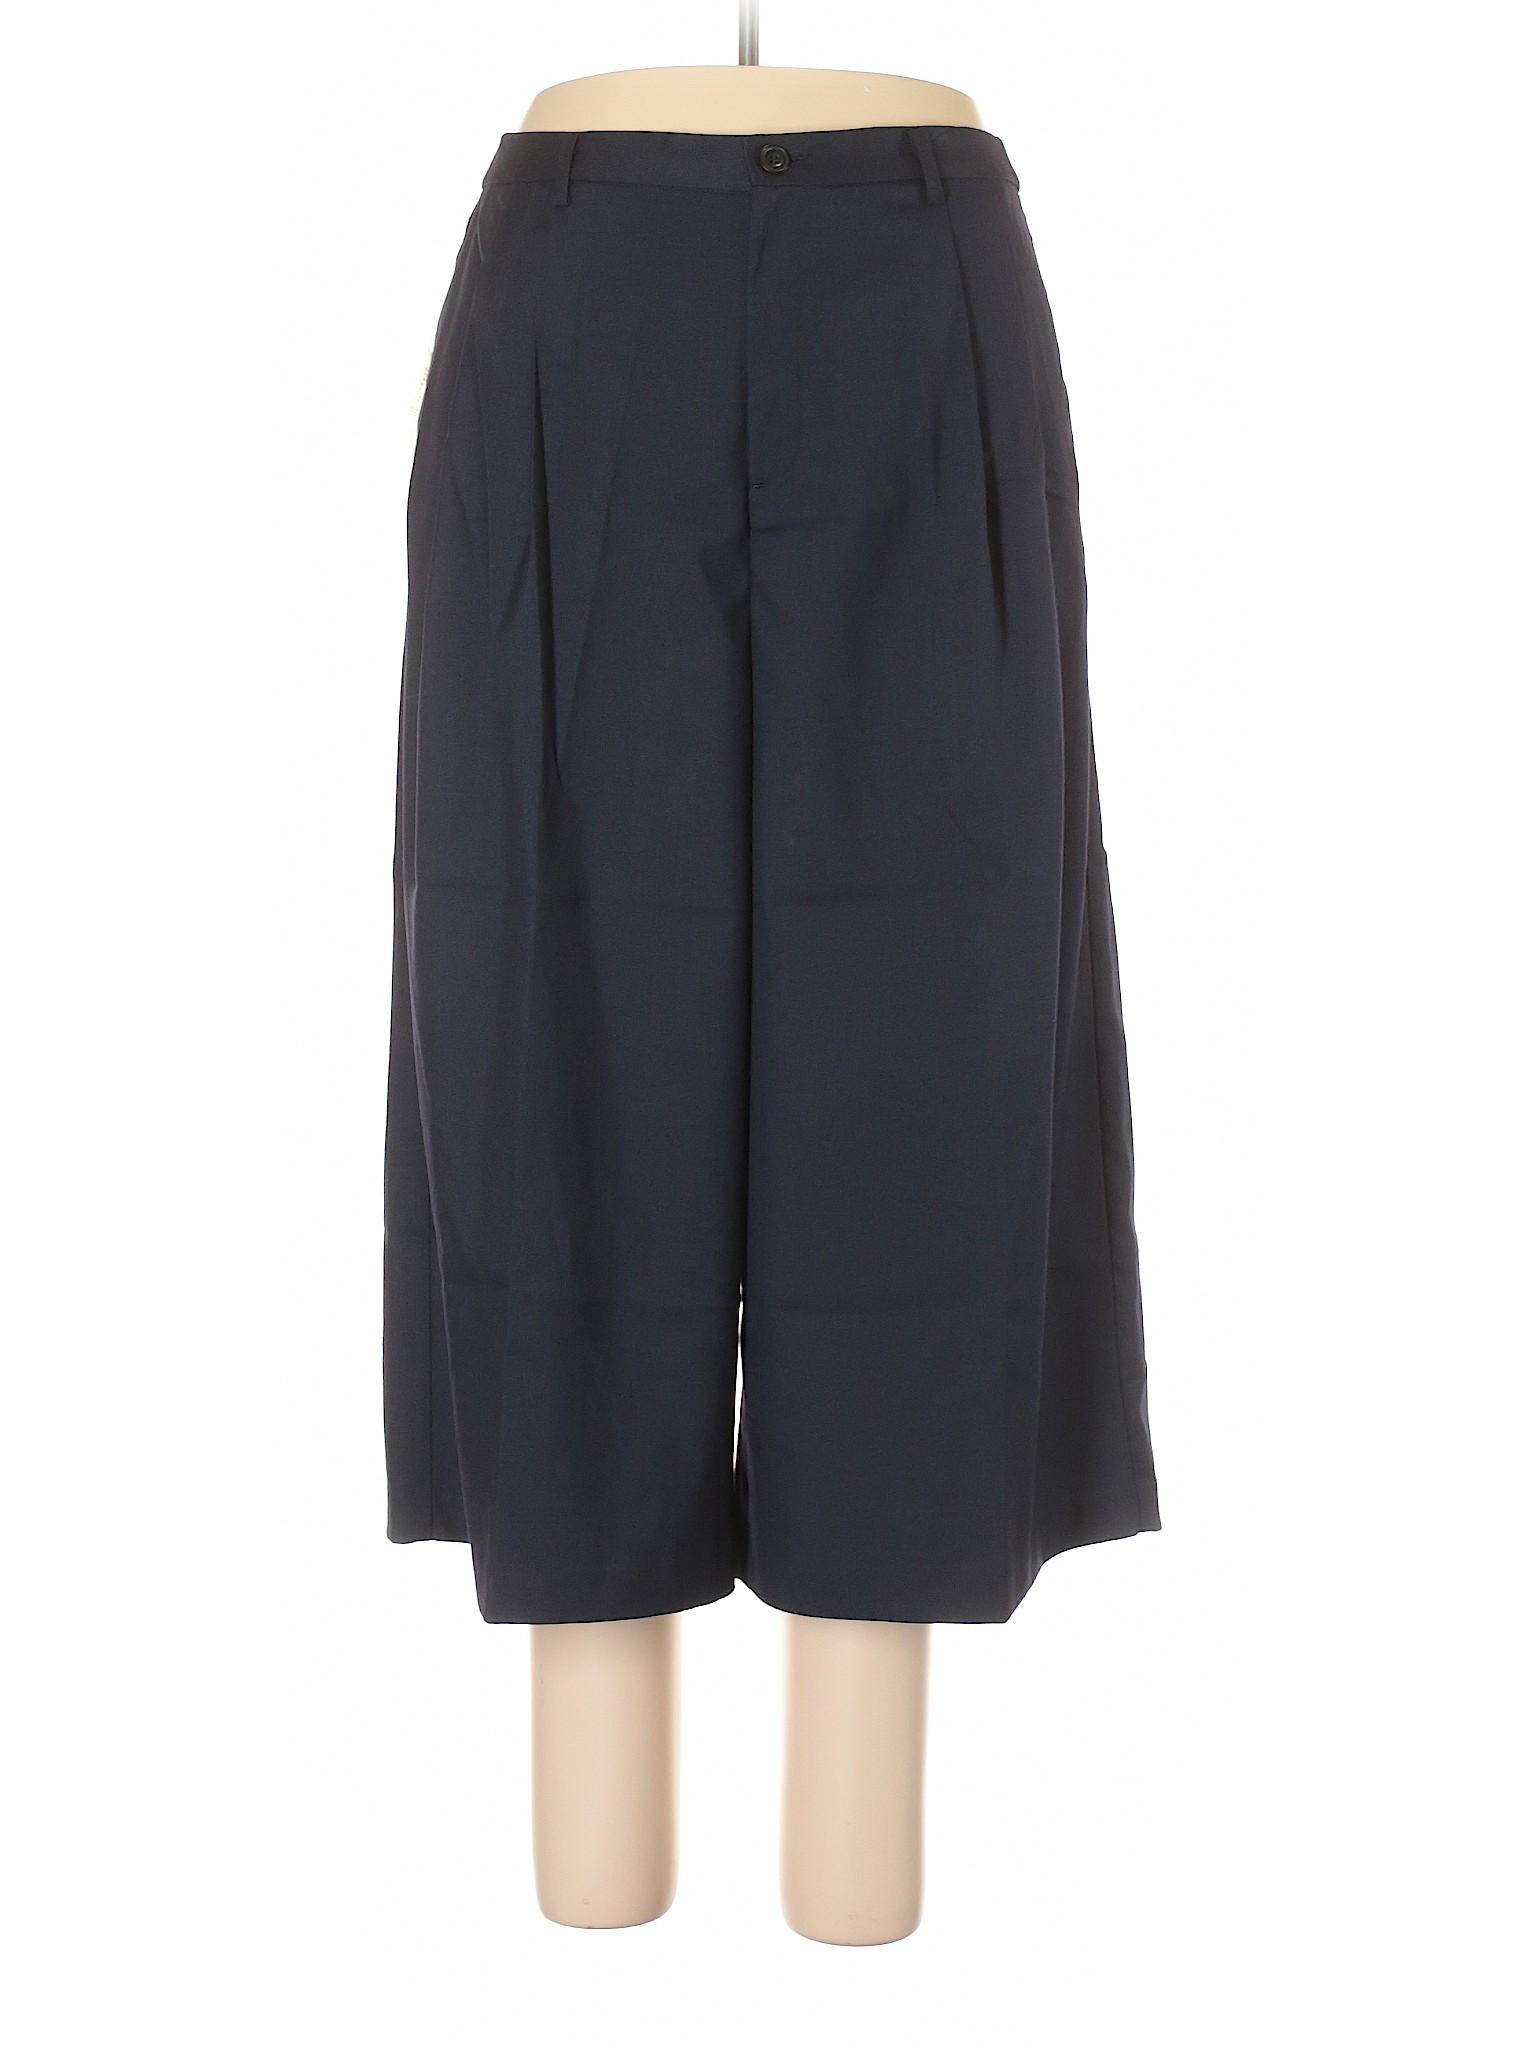 Uniqlo winter Boutique winter Boutique Pants Casual 1qH01Uxw